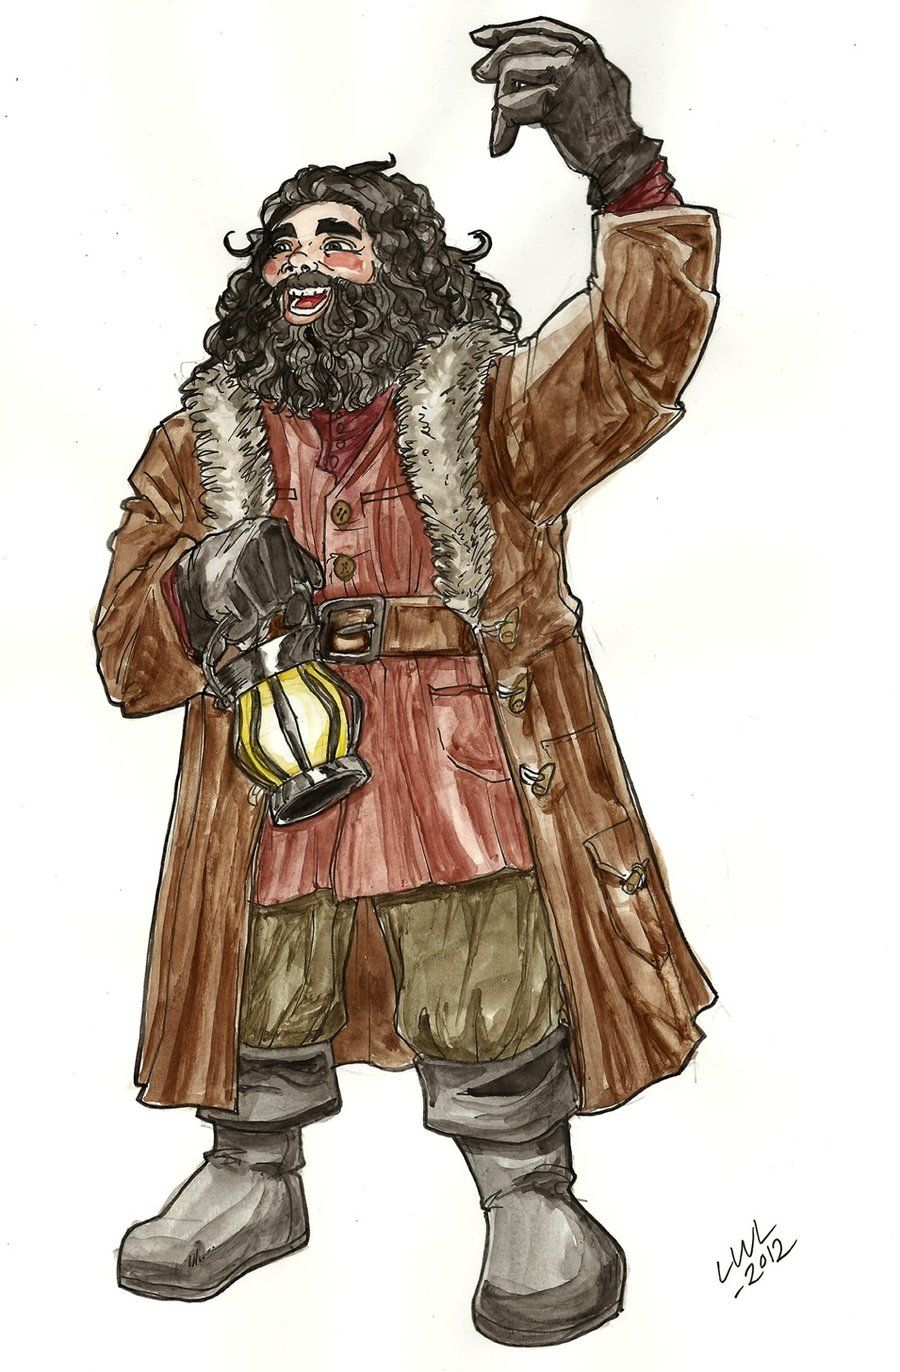 who is the gamekeeper of hogwarts